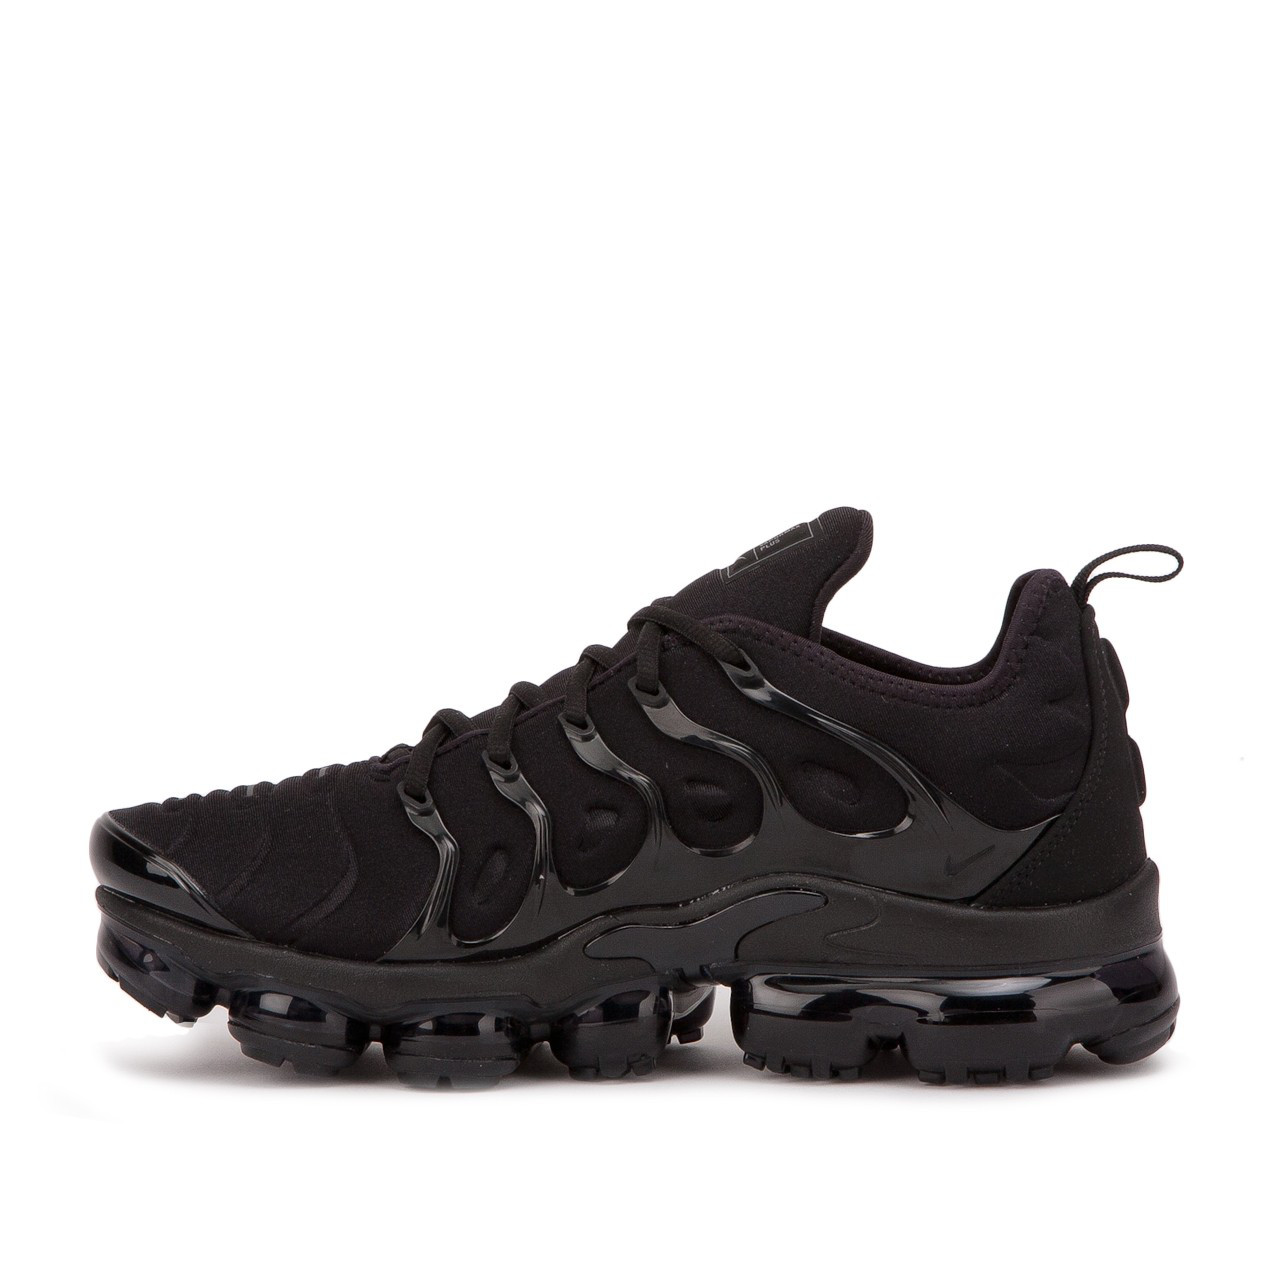 3ac24c75 Кроссовки Nike Air Vapormax Plus